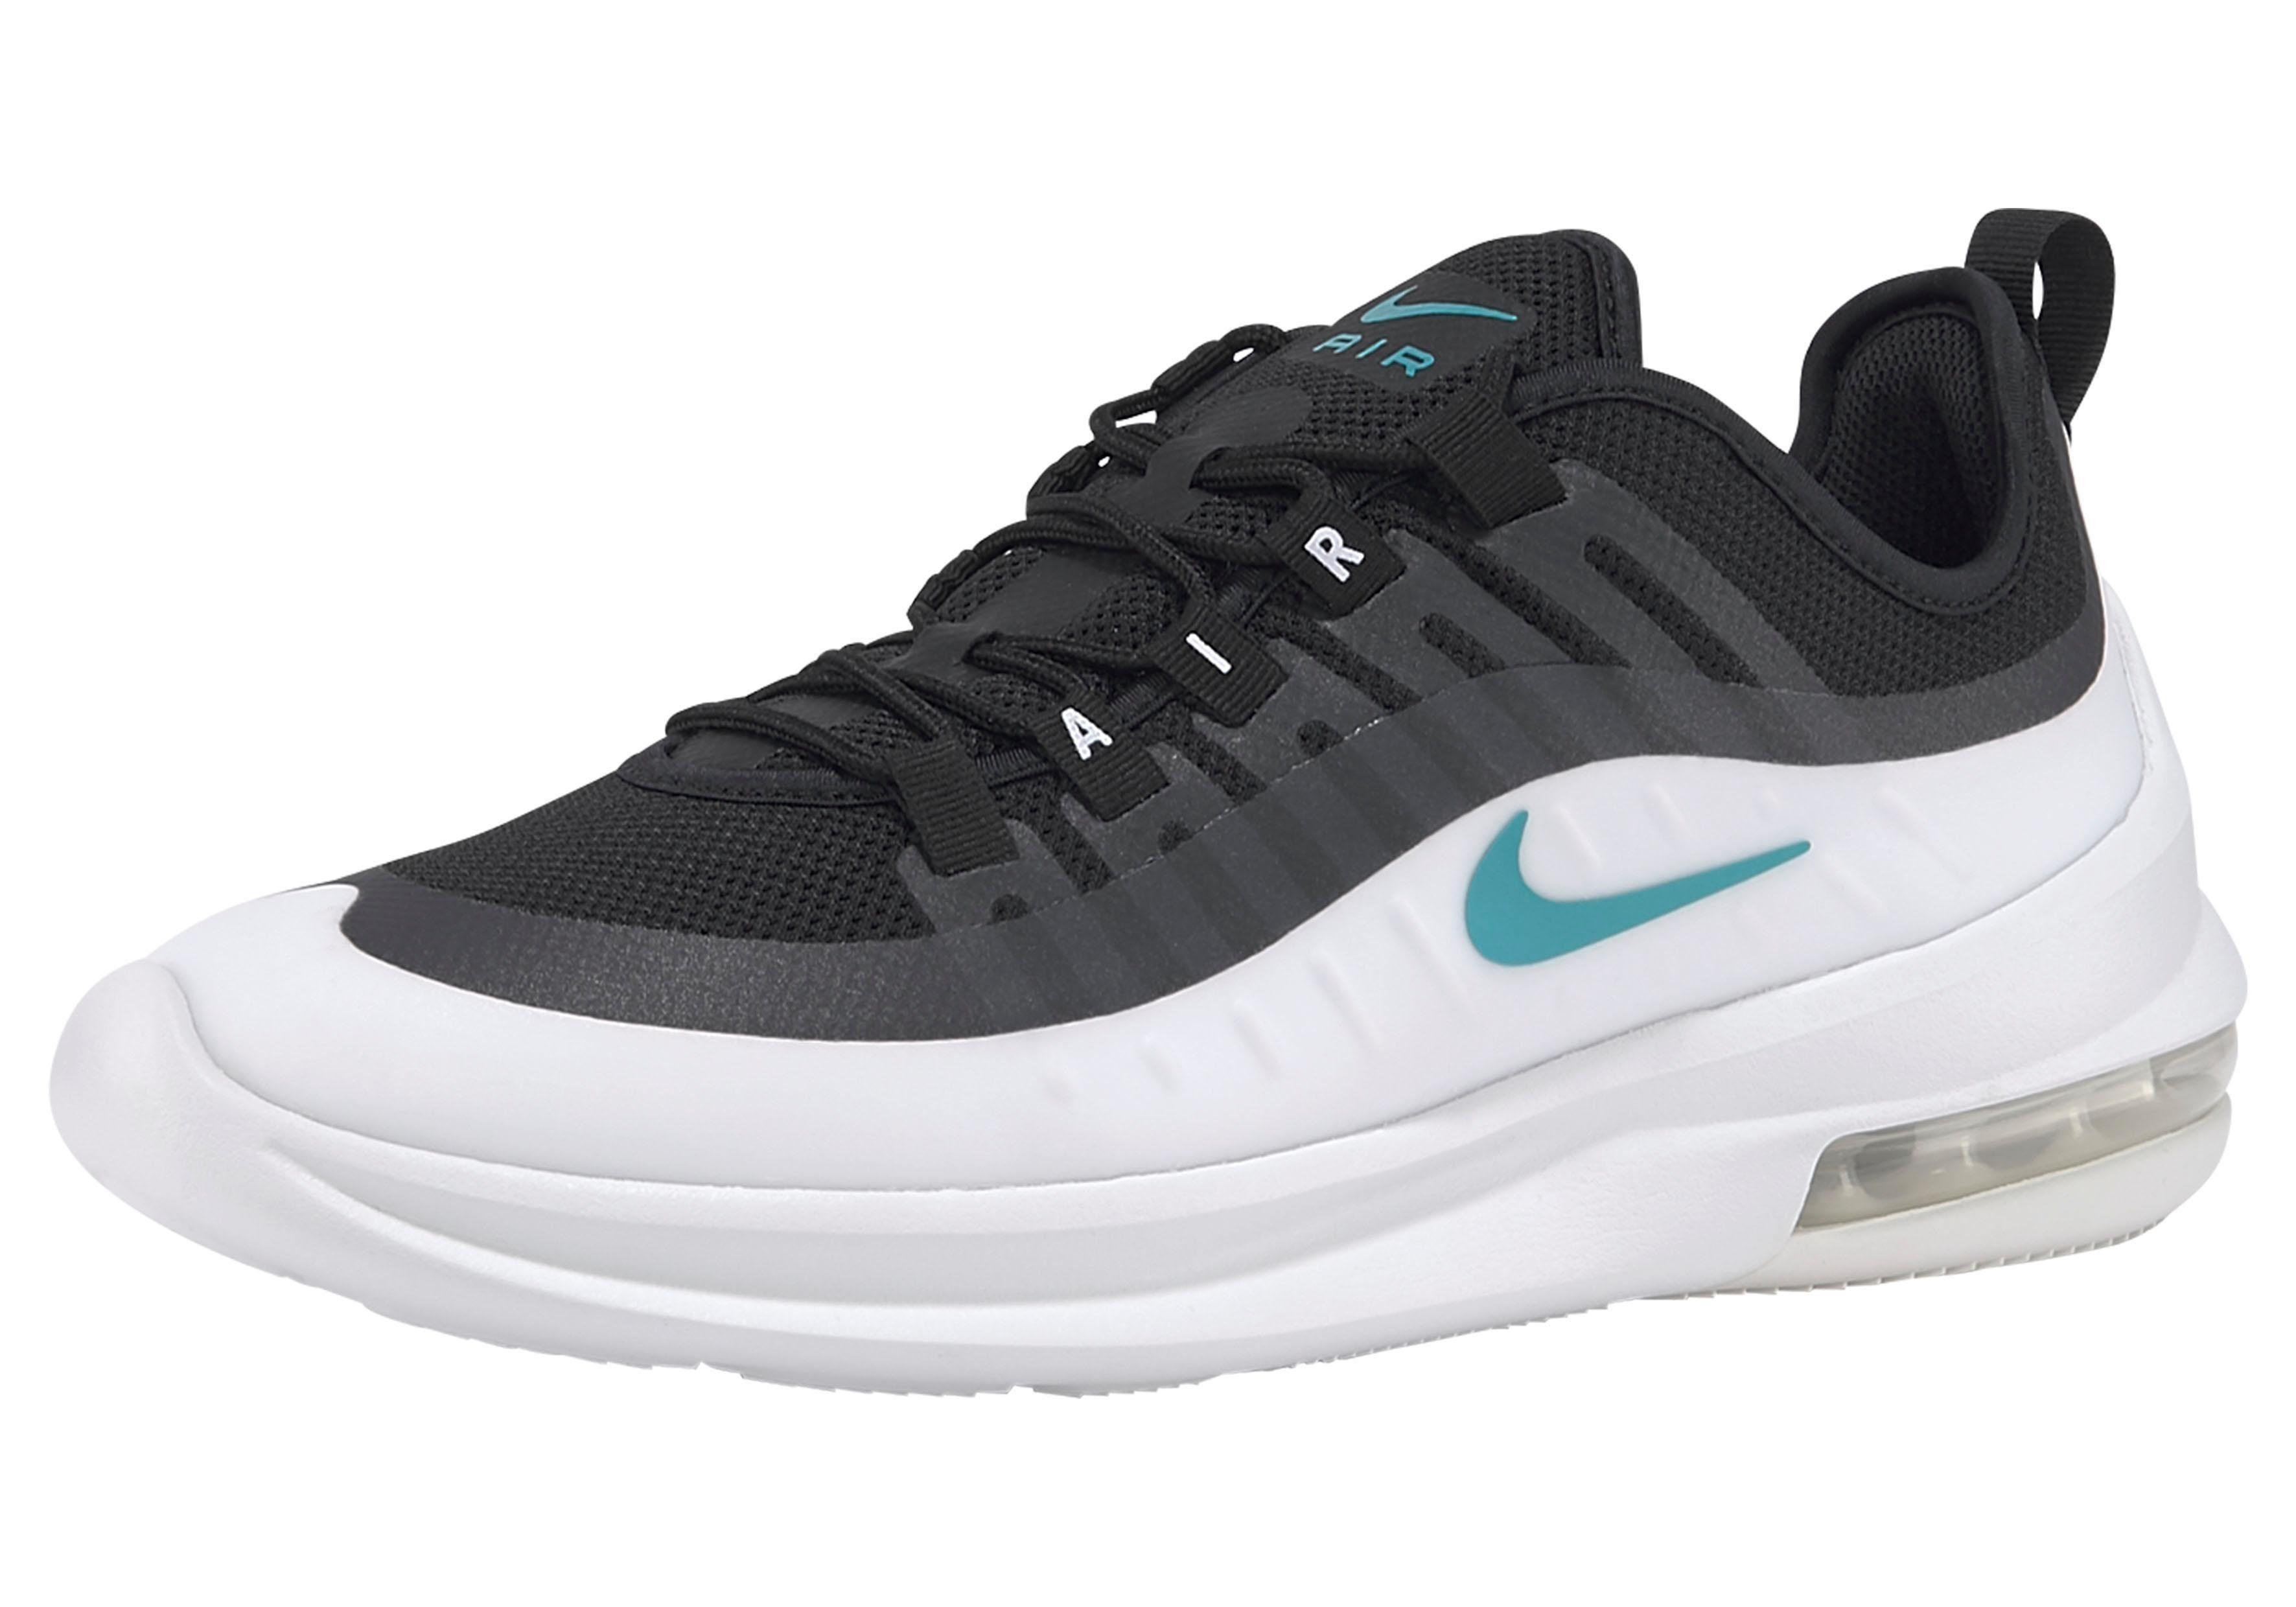 Nike Sportswear »Air Max Axis« Sneaker, Atmungsaktives Obermaterial aus Synthetik und Textil online kaufen | OTTO